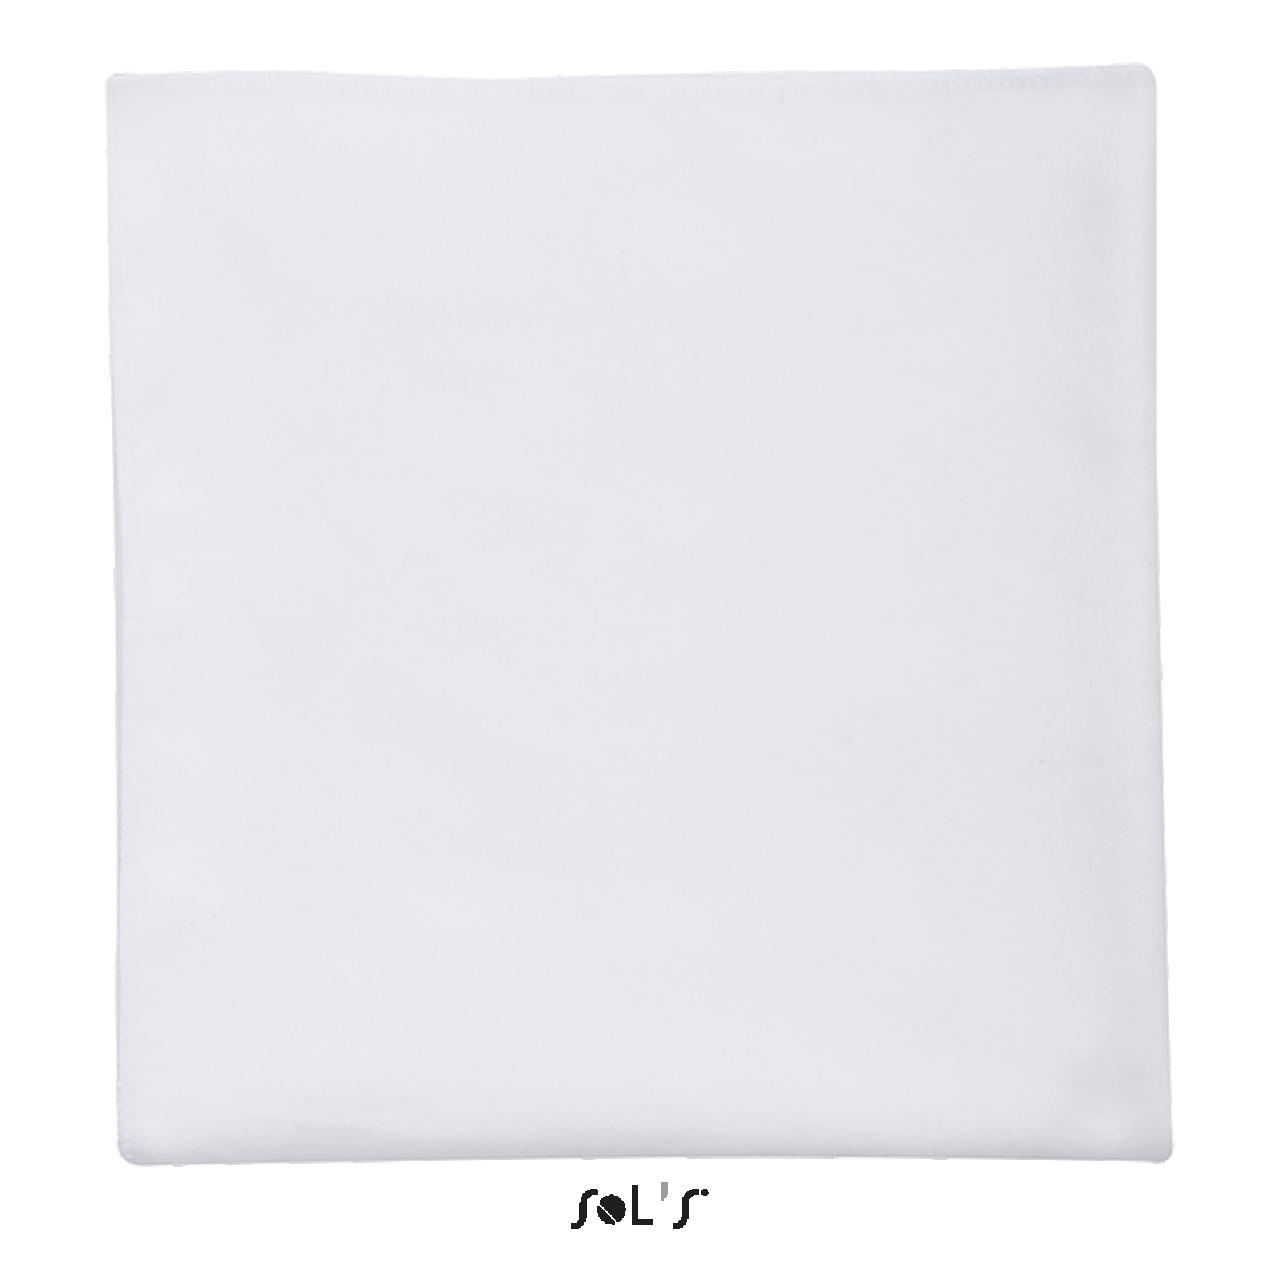 ATOLL 50 - MICROFIBRE TOWEL